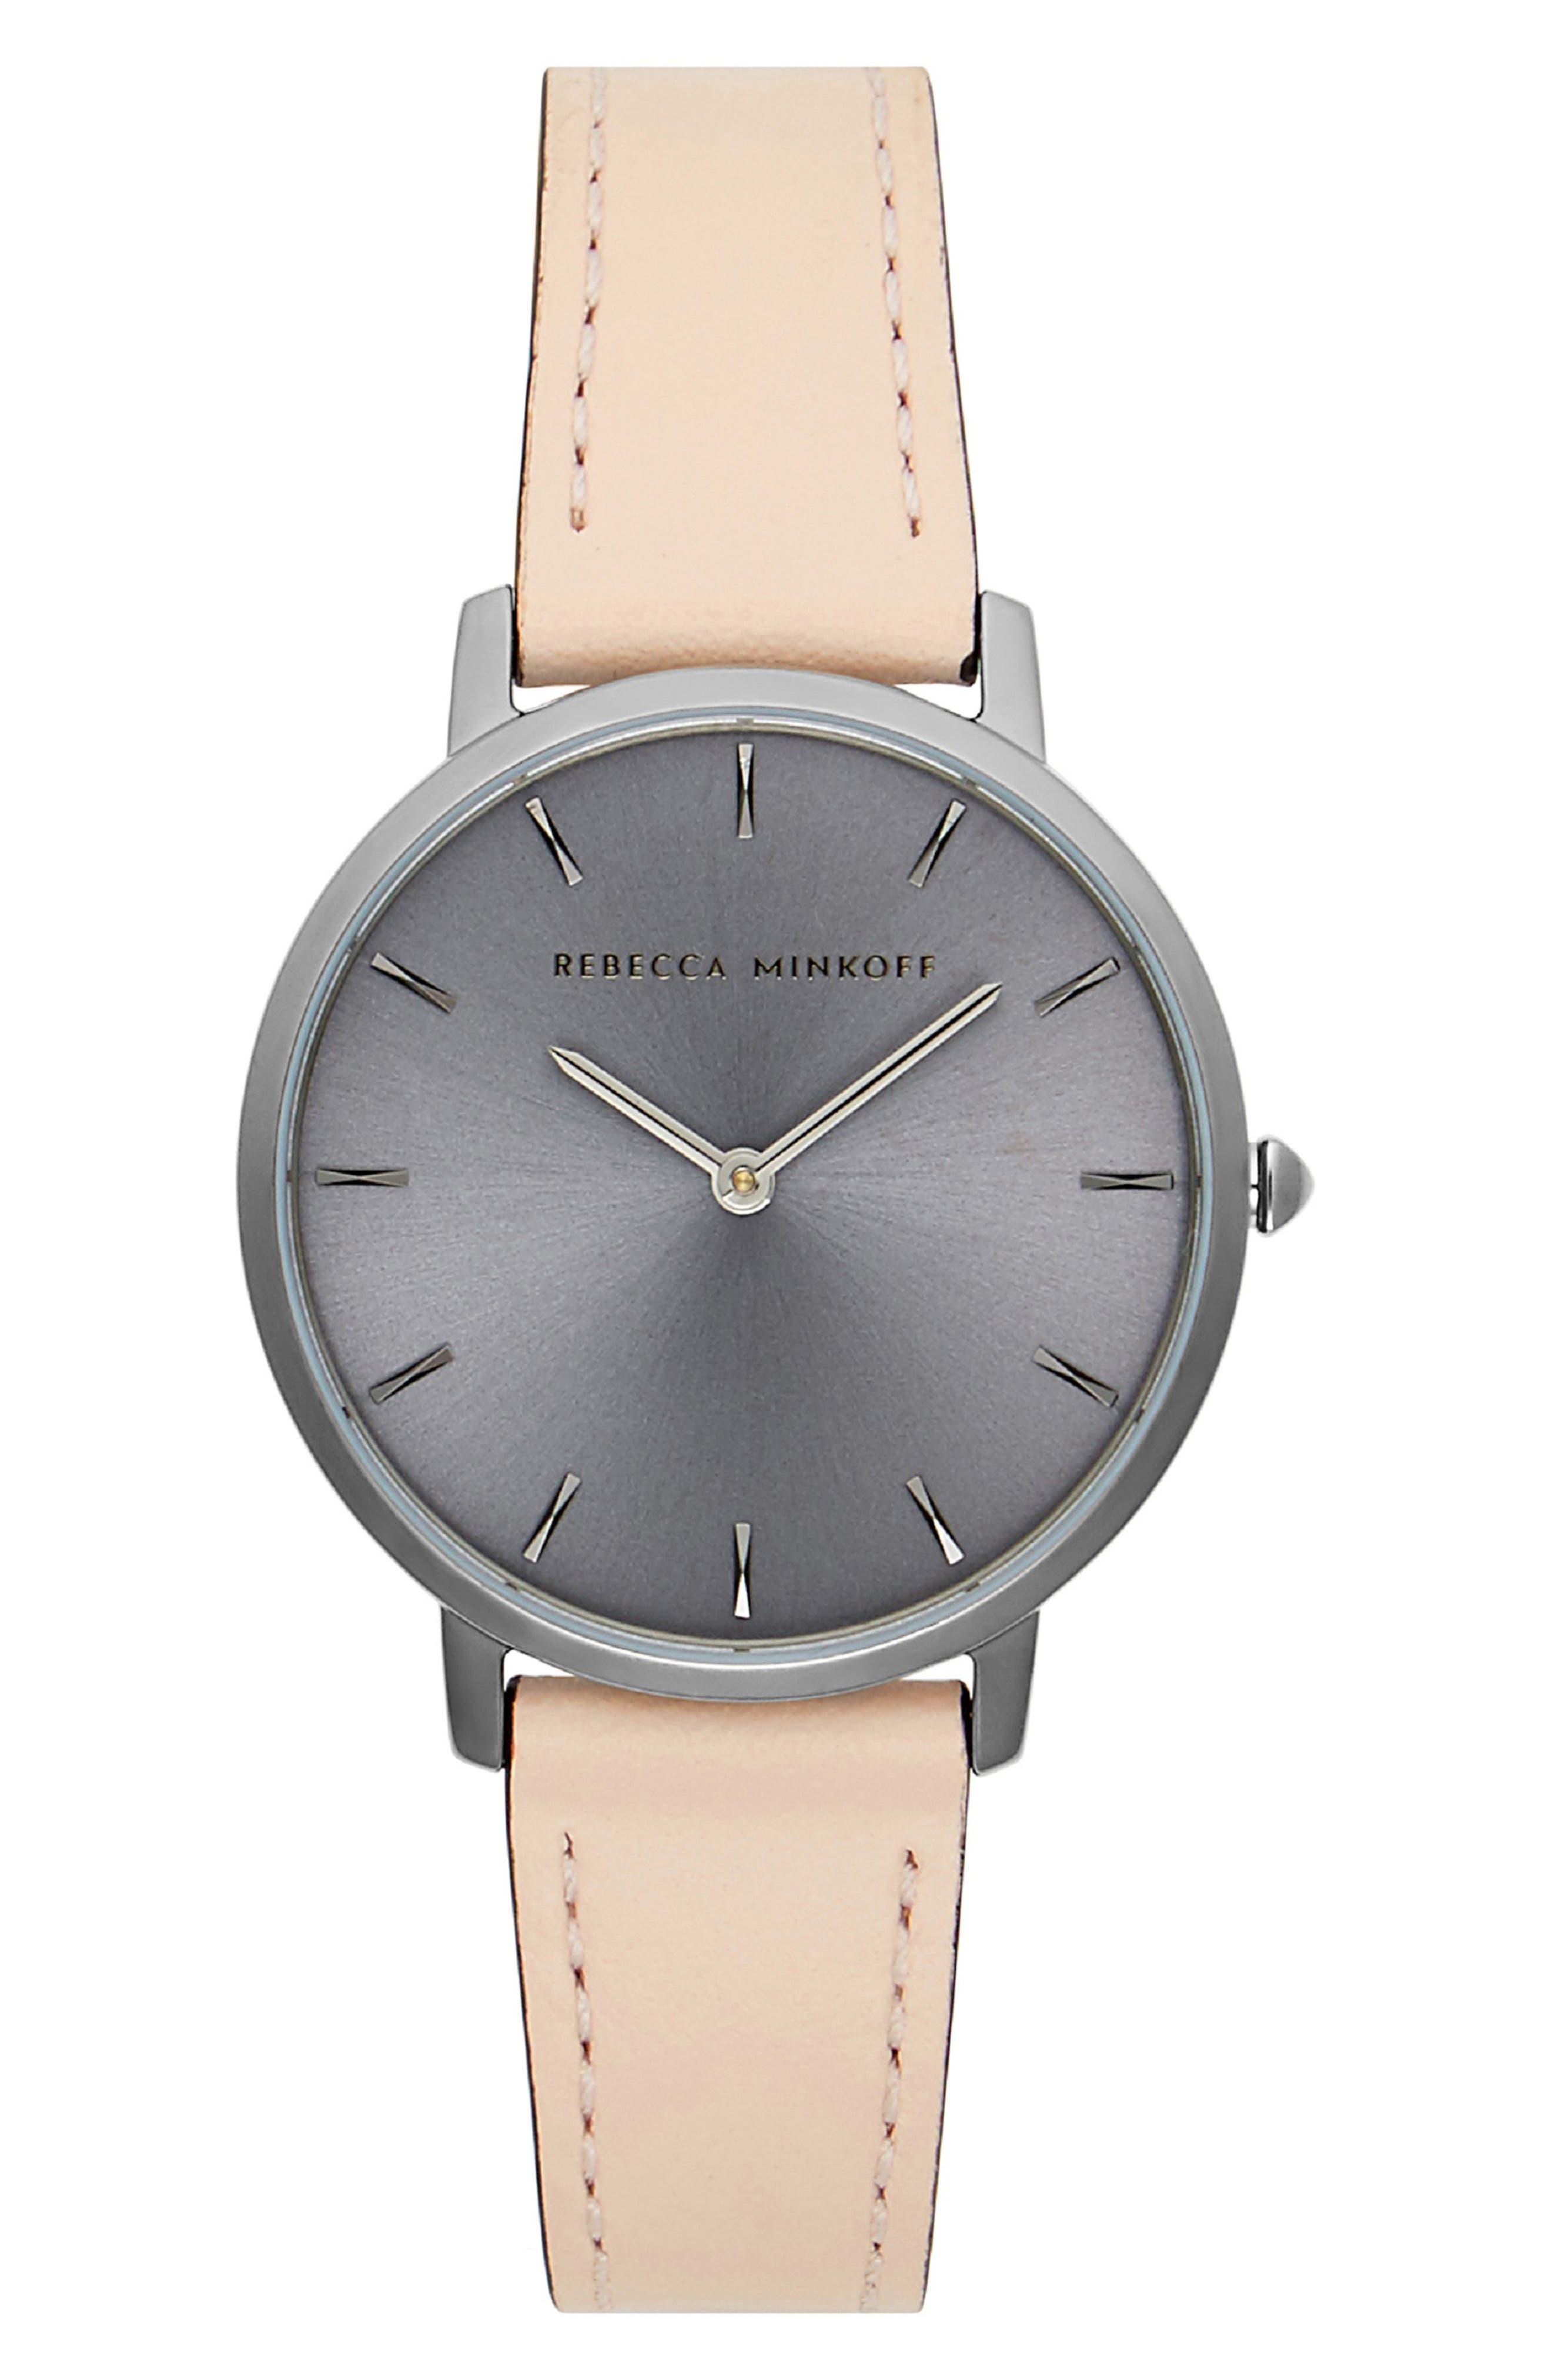 REBECCA MINKOFF Major Leather Strap Watch, 35mm, Main, color, BLUSH/ GREY